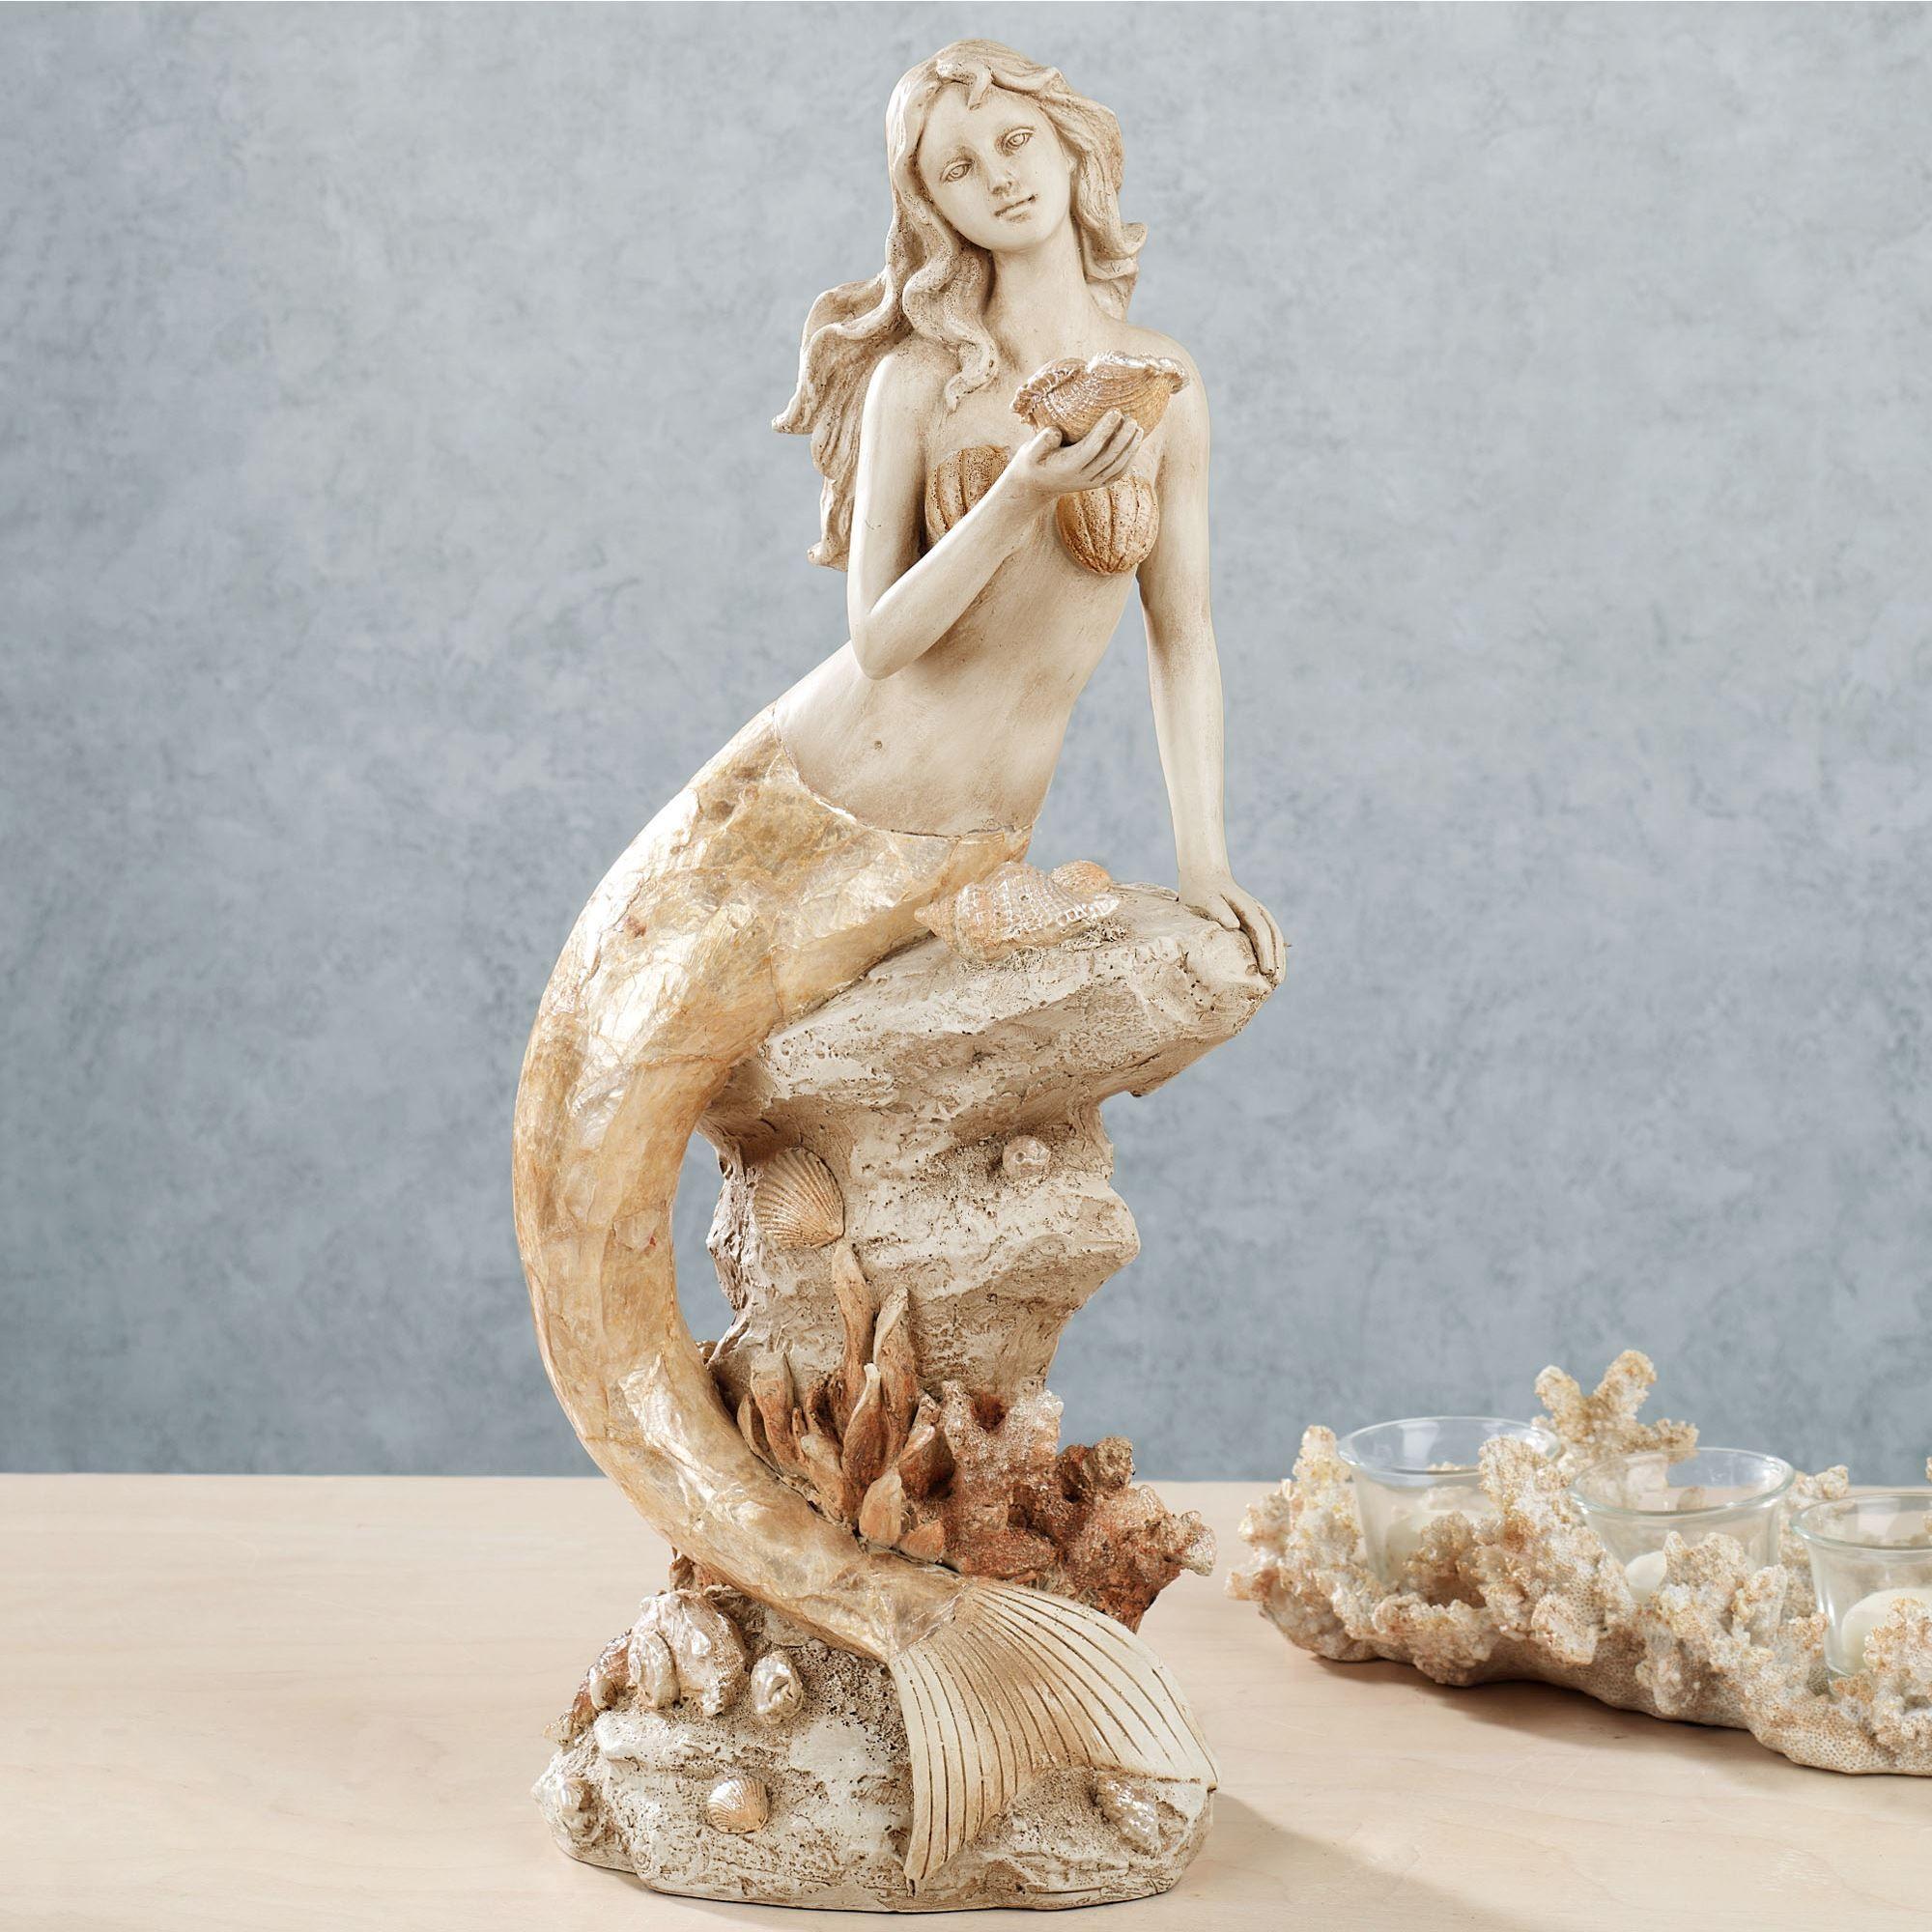 Moonlight Mermaid Table Sculpture